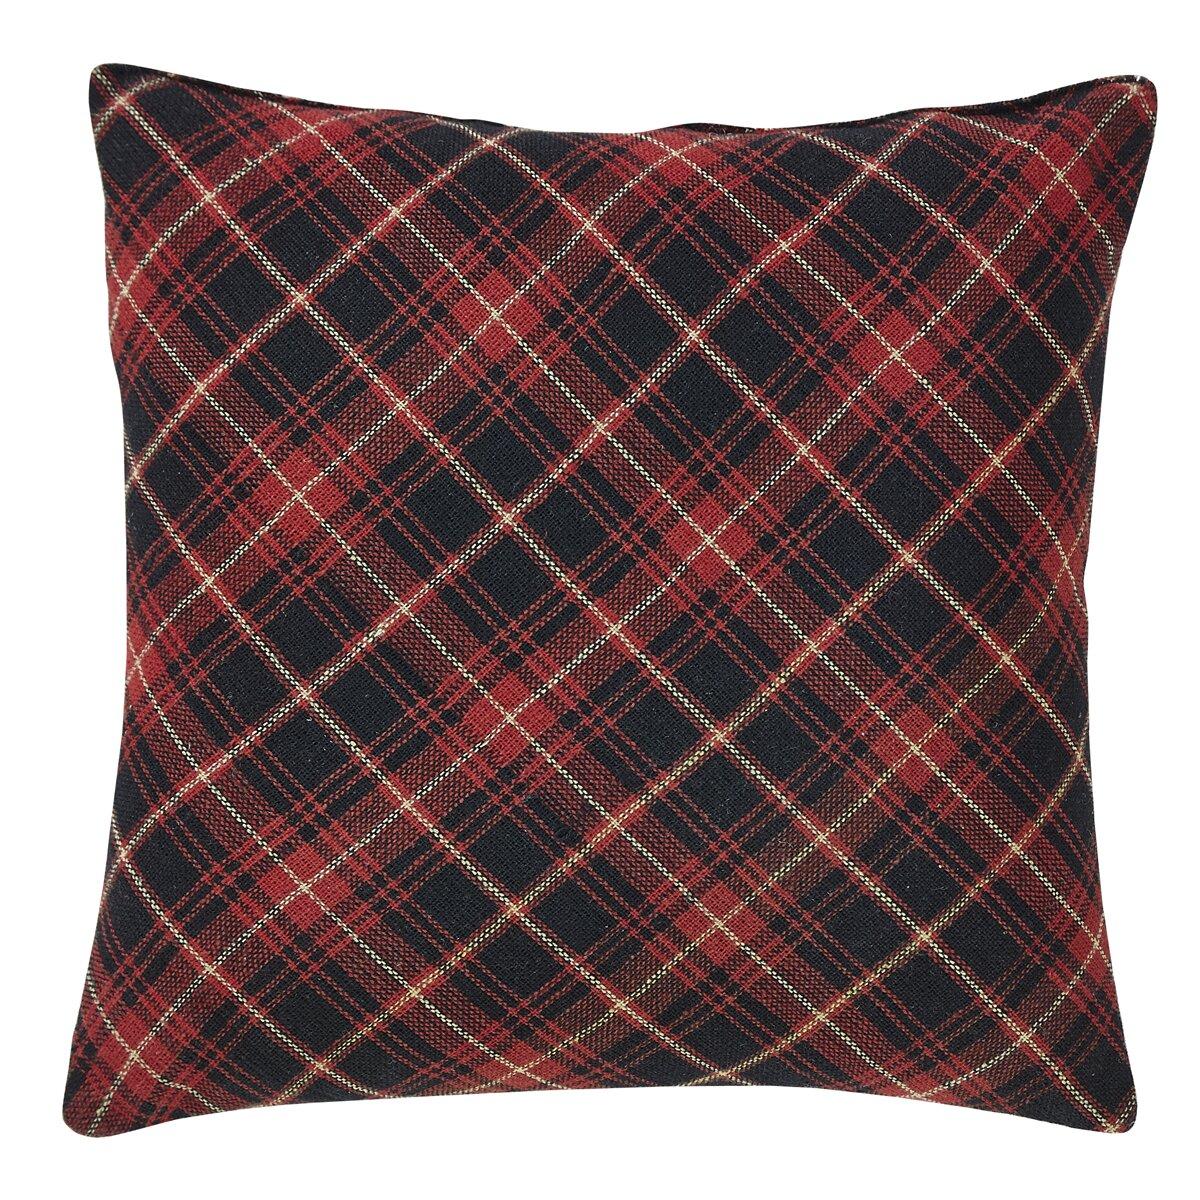 Throw Pillows Set : Charlton Home Seasons Greetings 2 Piece Cotton Throw Pillow Set & Reviews Wayfair.ca